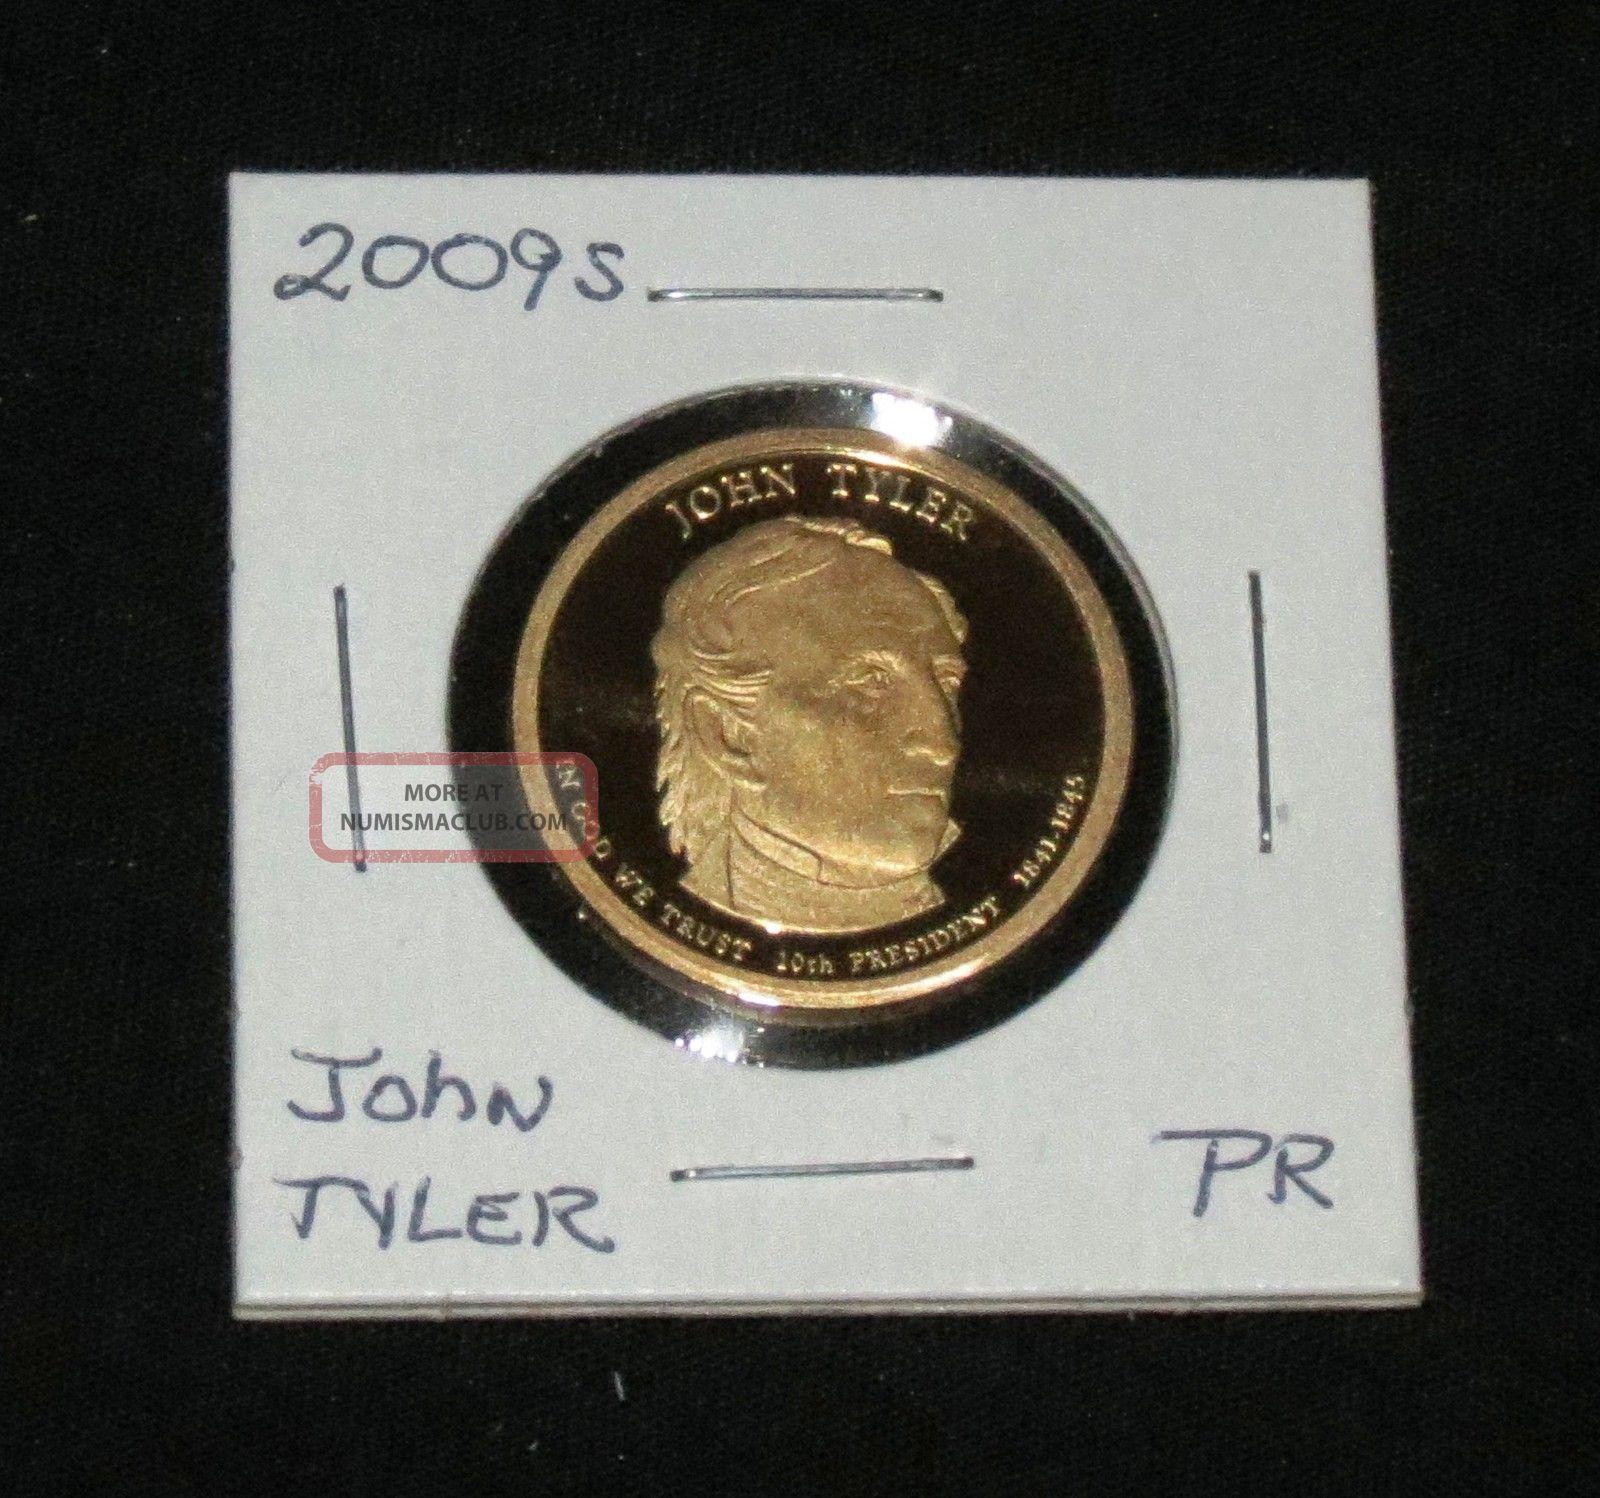 2009s Pres.  John Tyler Proof Dollars photo